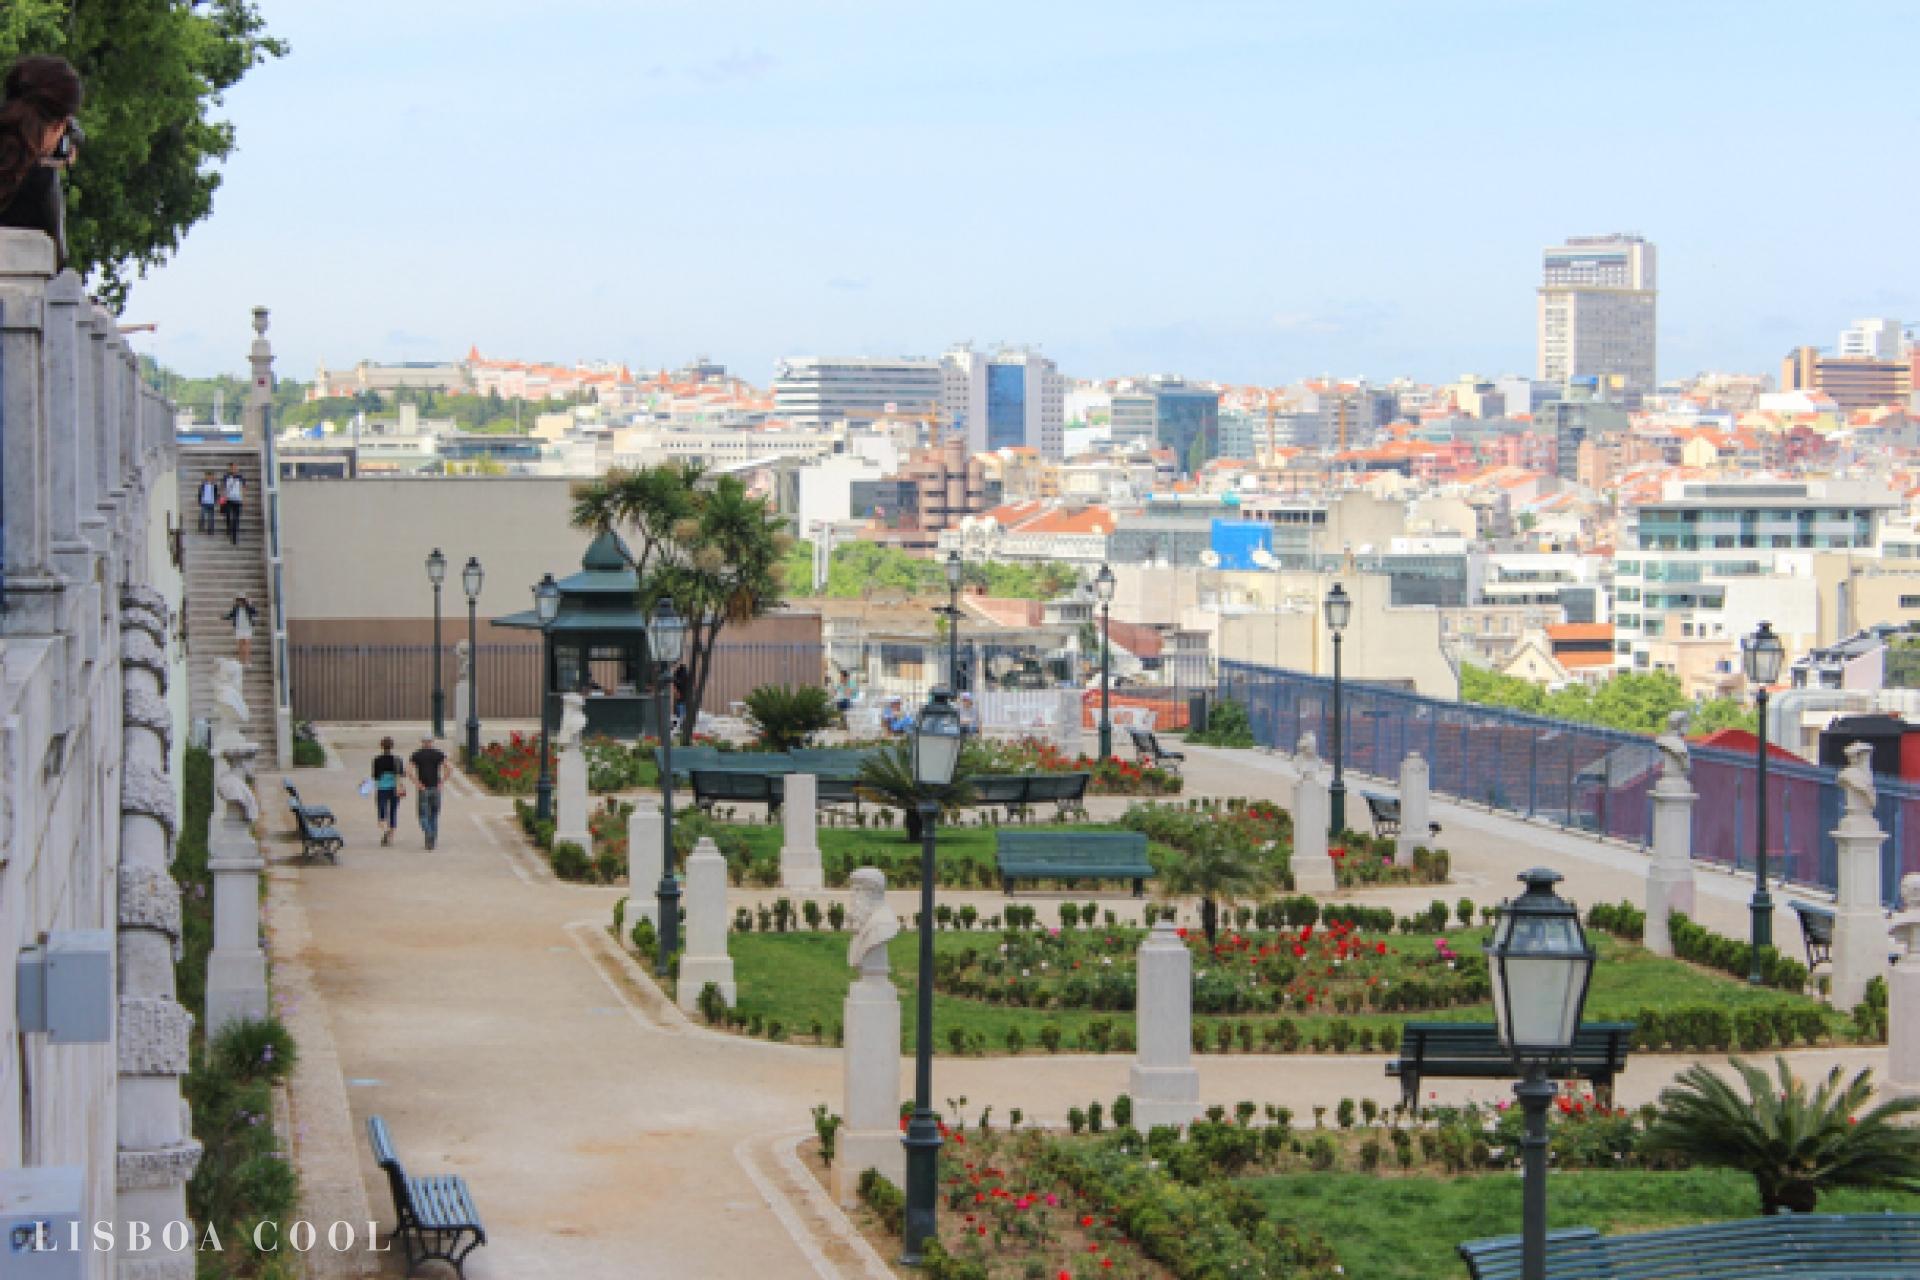 LisboaCool_Visit_São Pedro de Alcântara Viewpoint